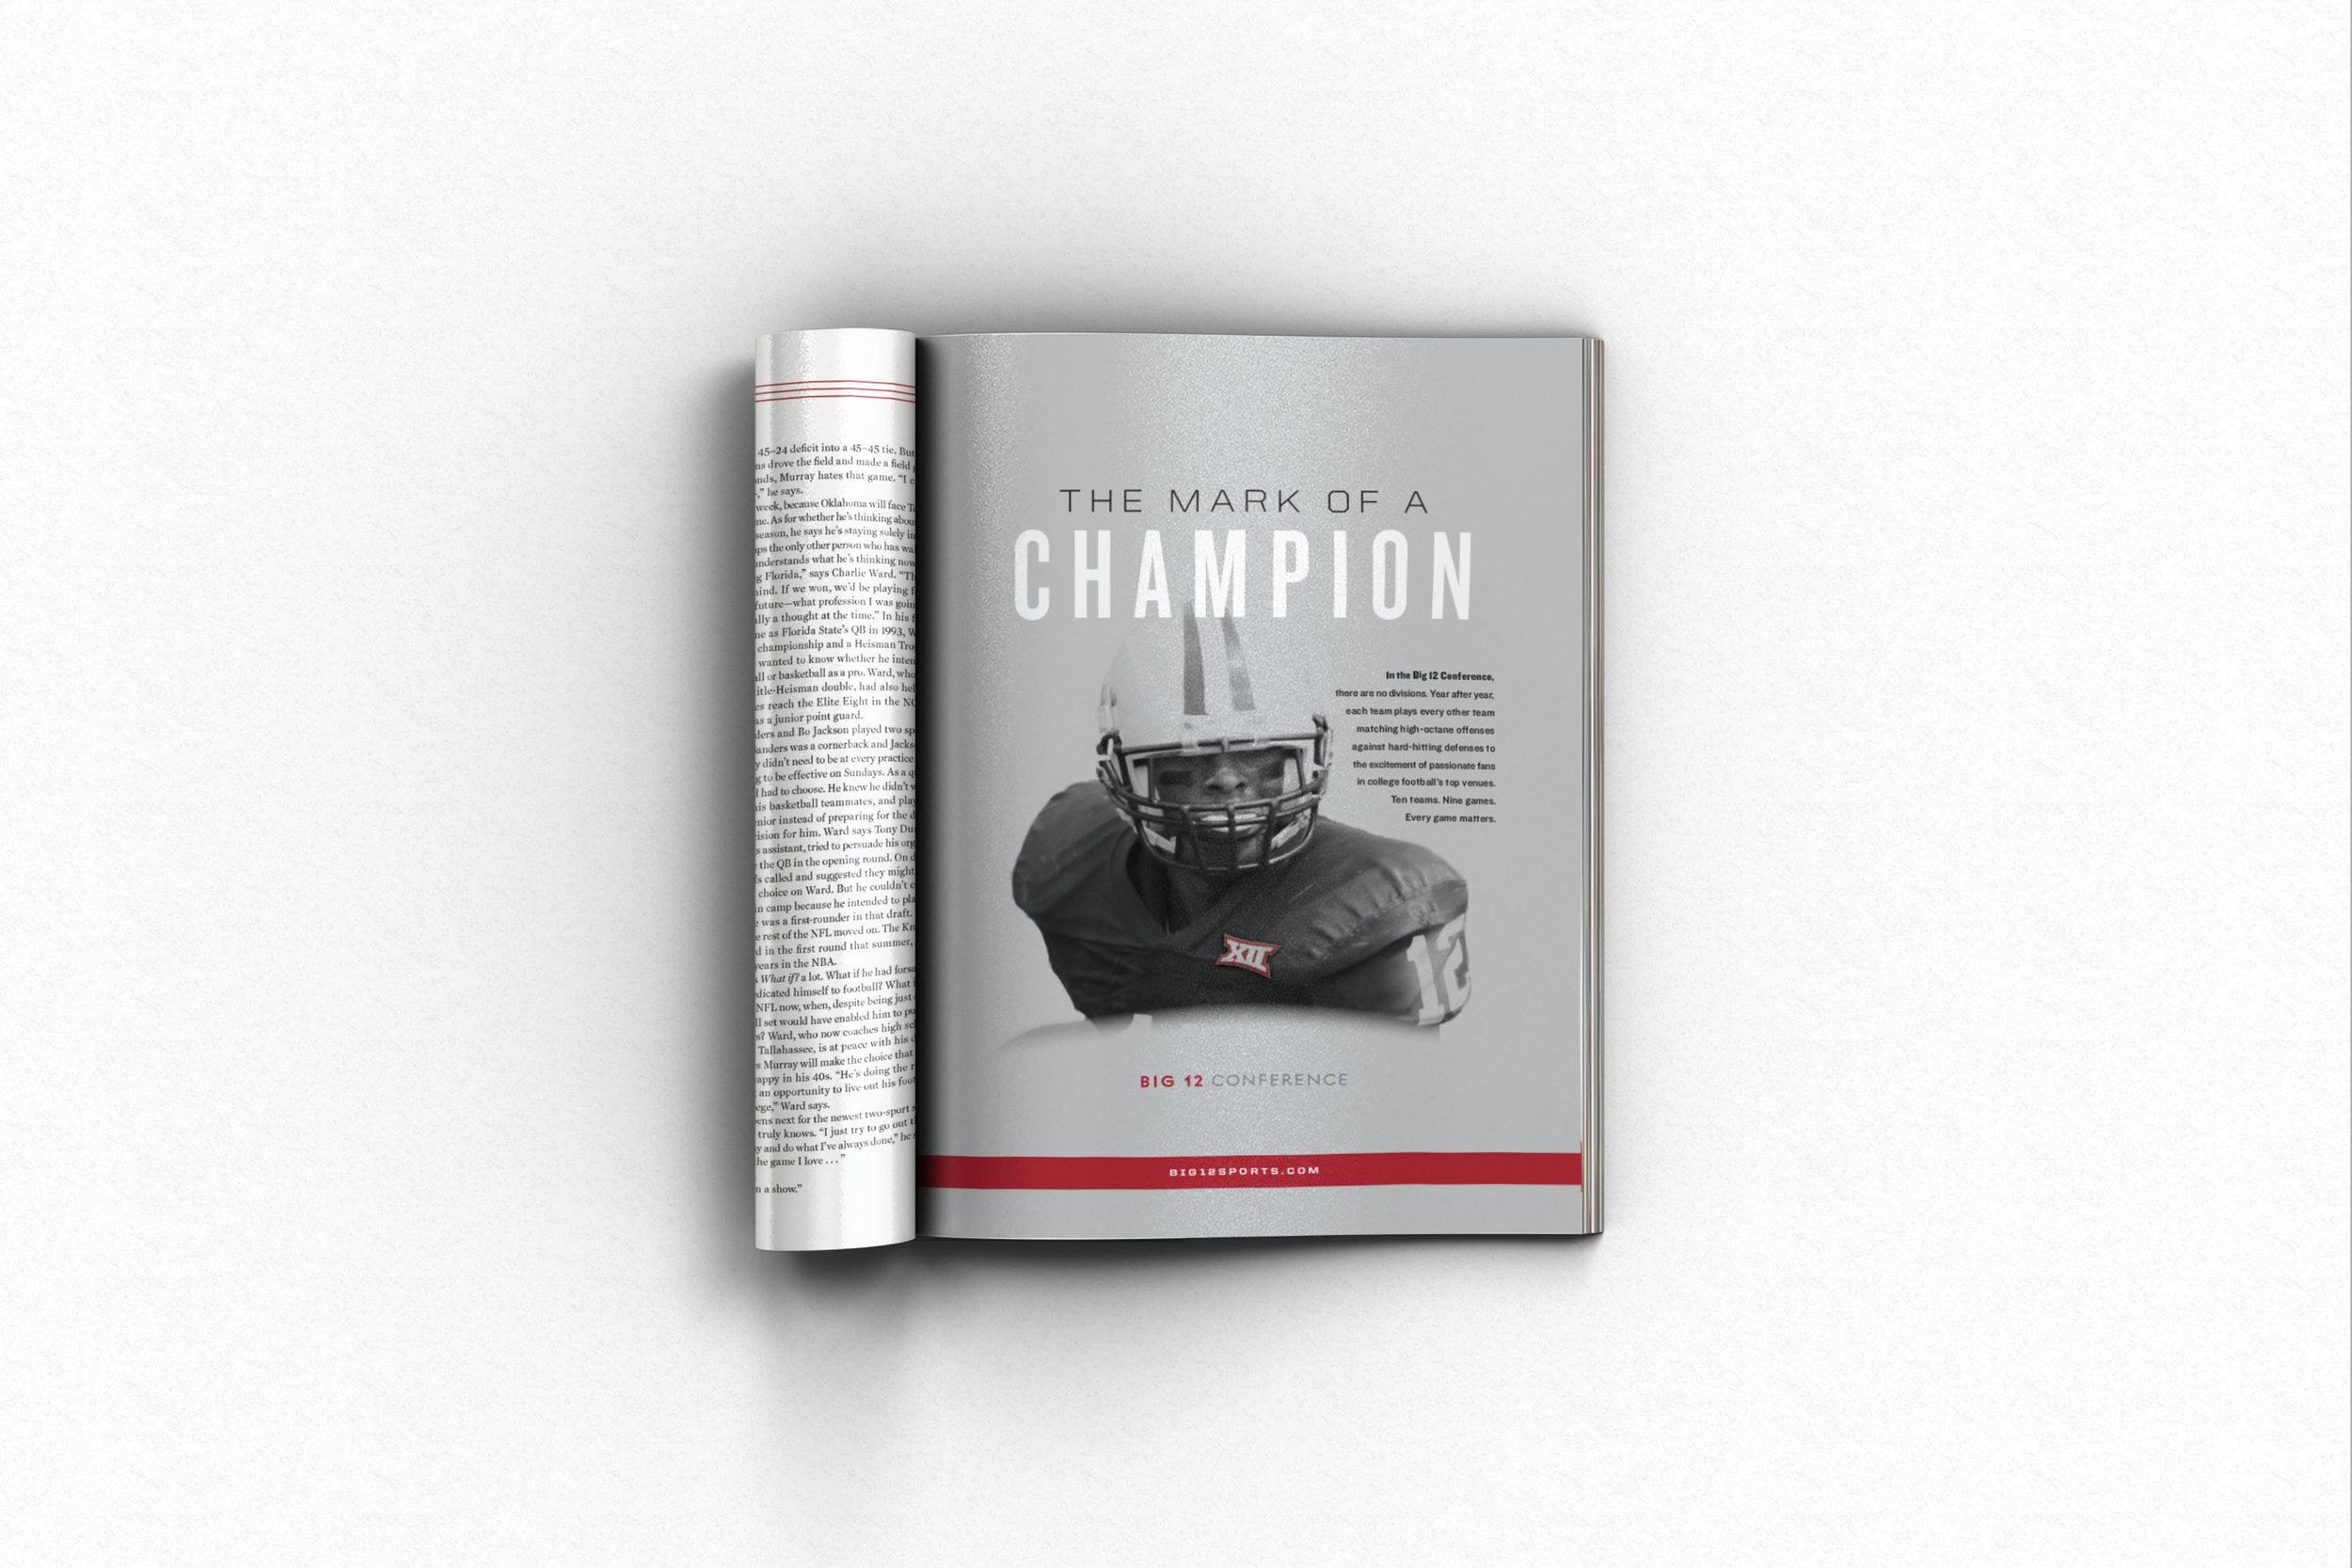 ronaldvillegas-big12-champion-ad.jpg